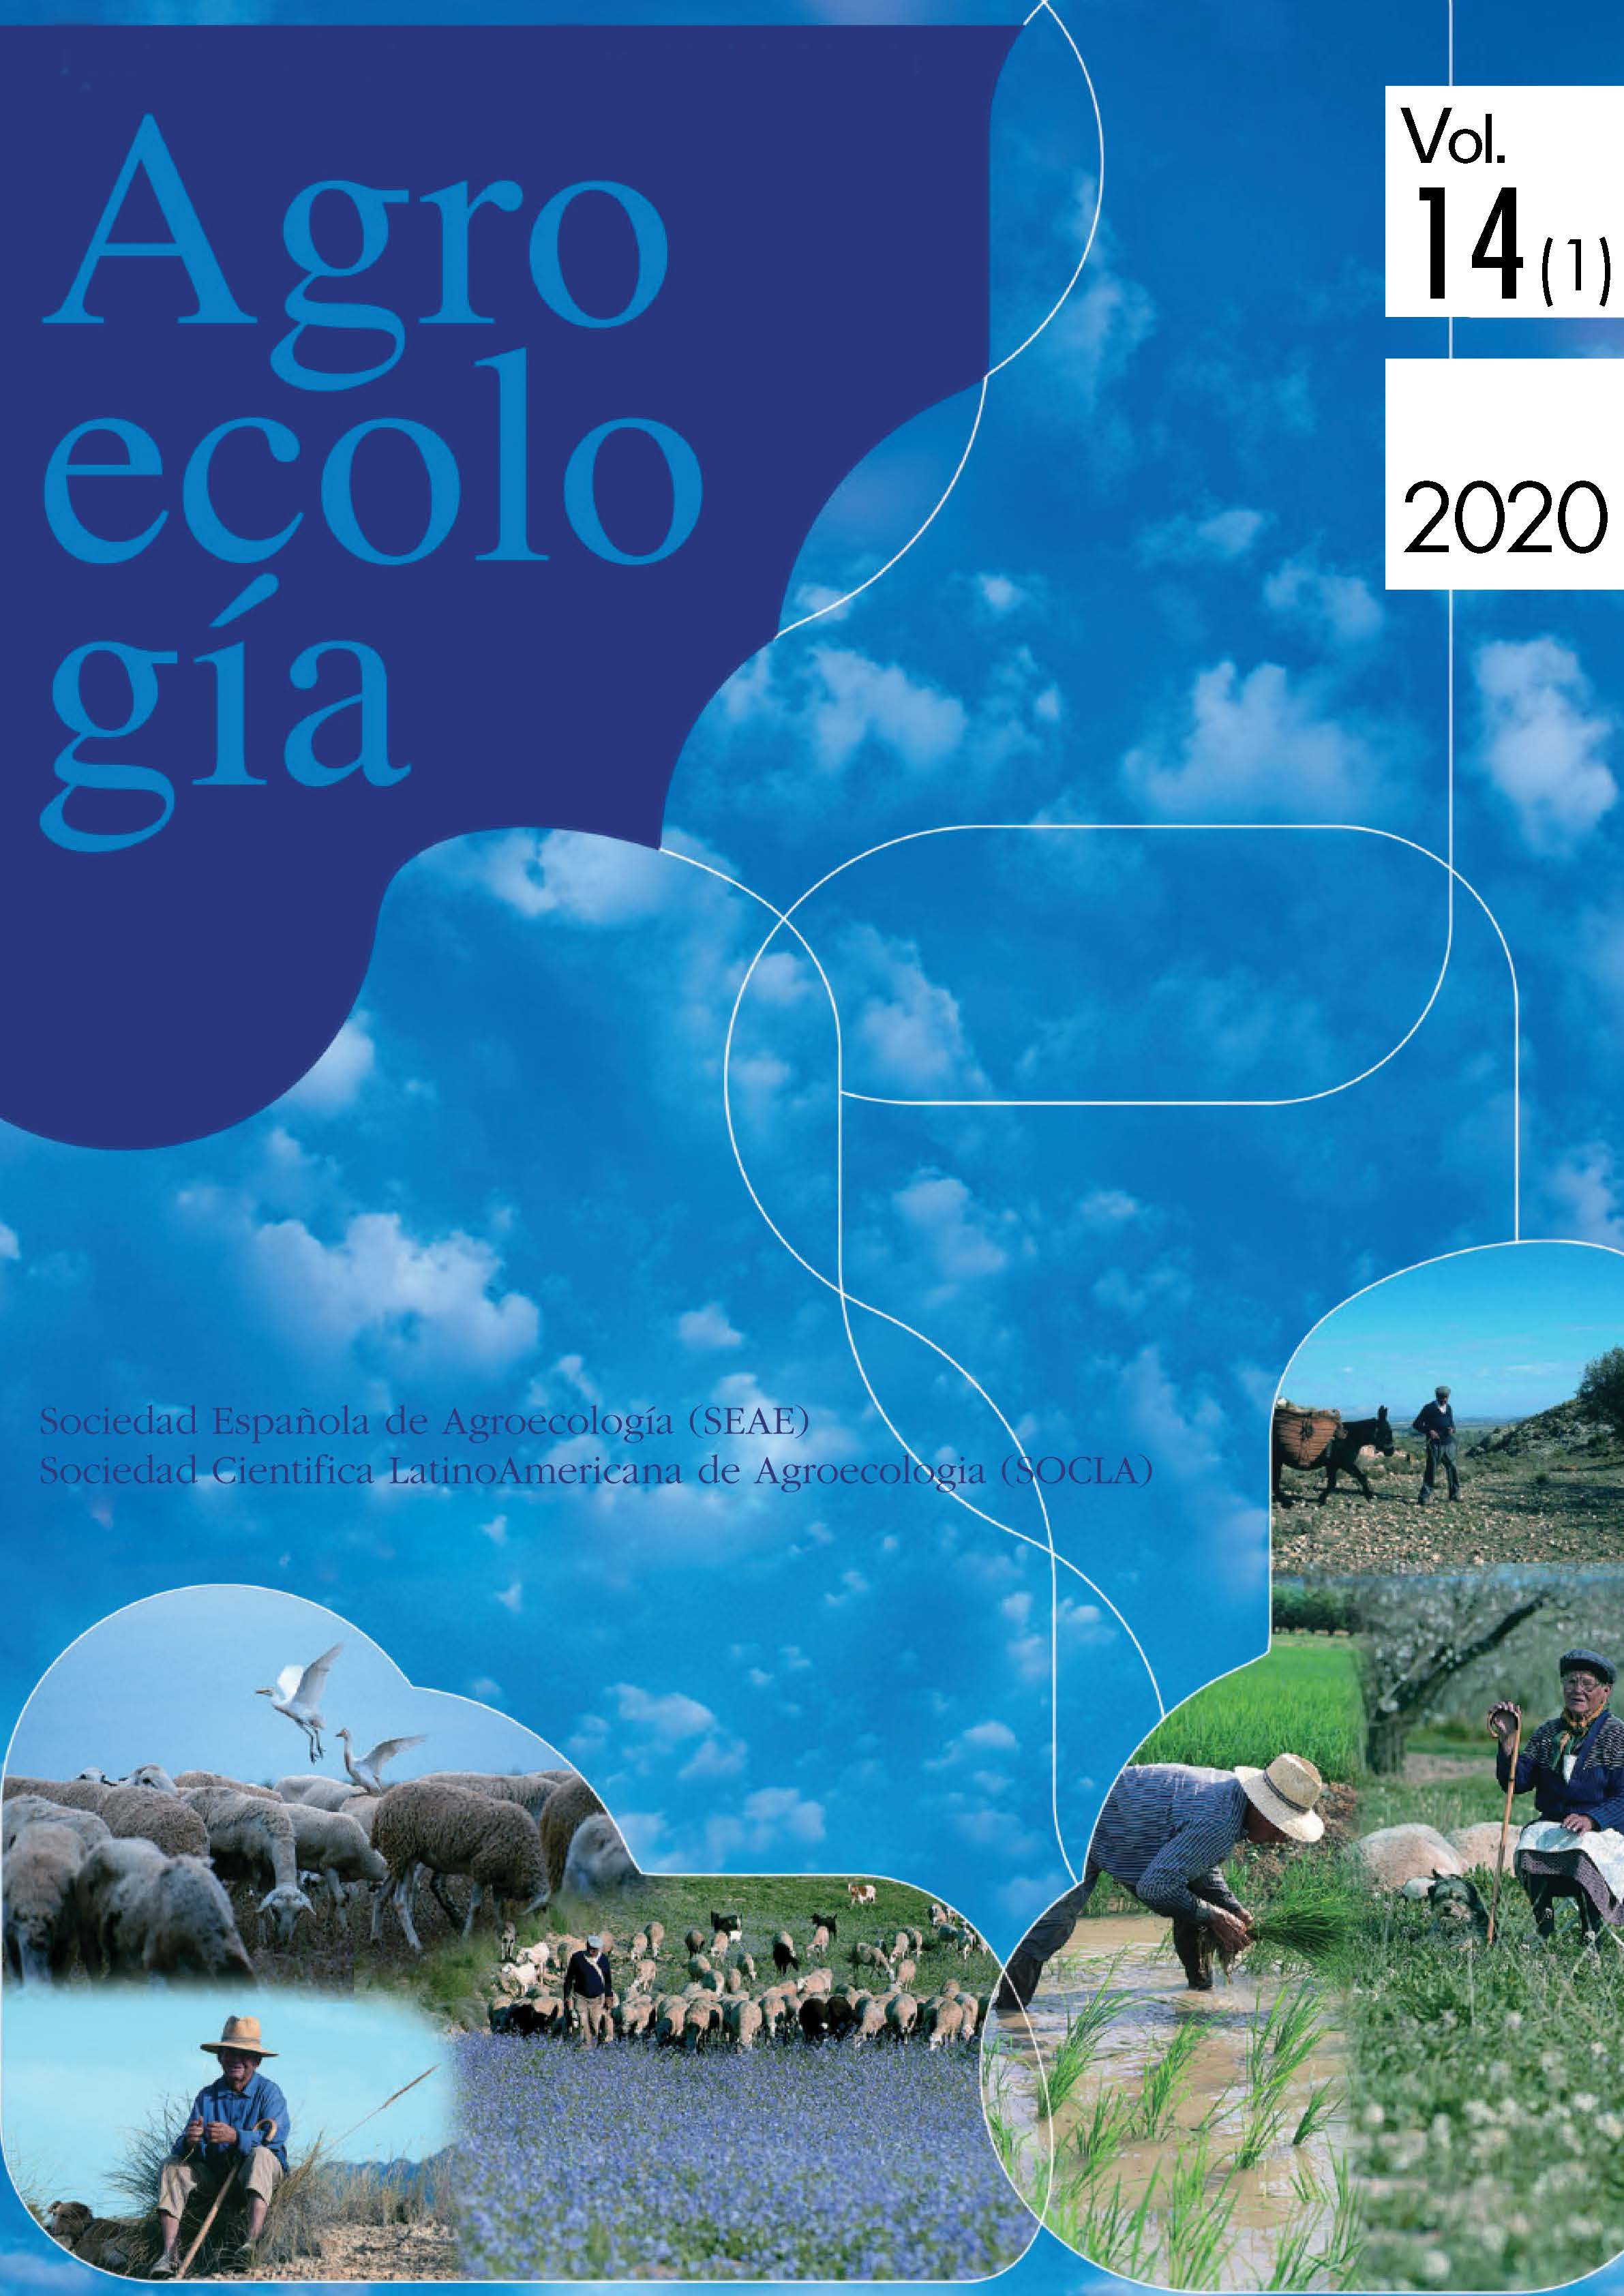 Ver Vol. 14 Núm. 1 (2020): Revista Agroecología nº 14 (1)